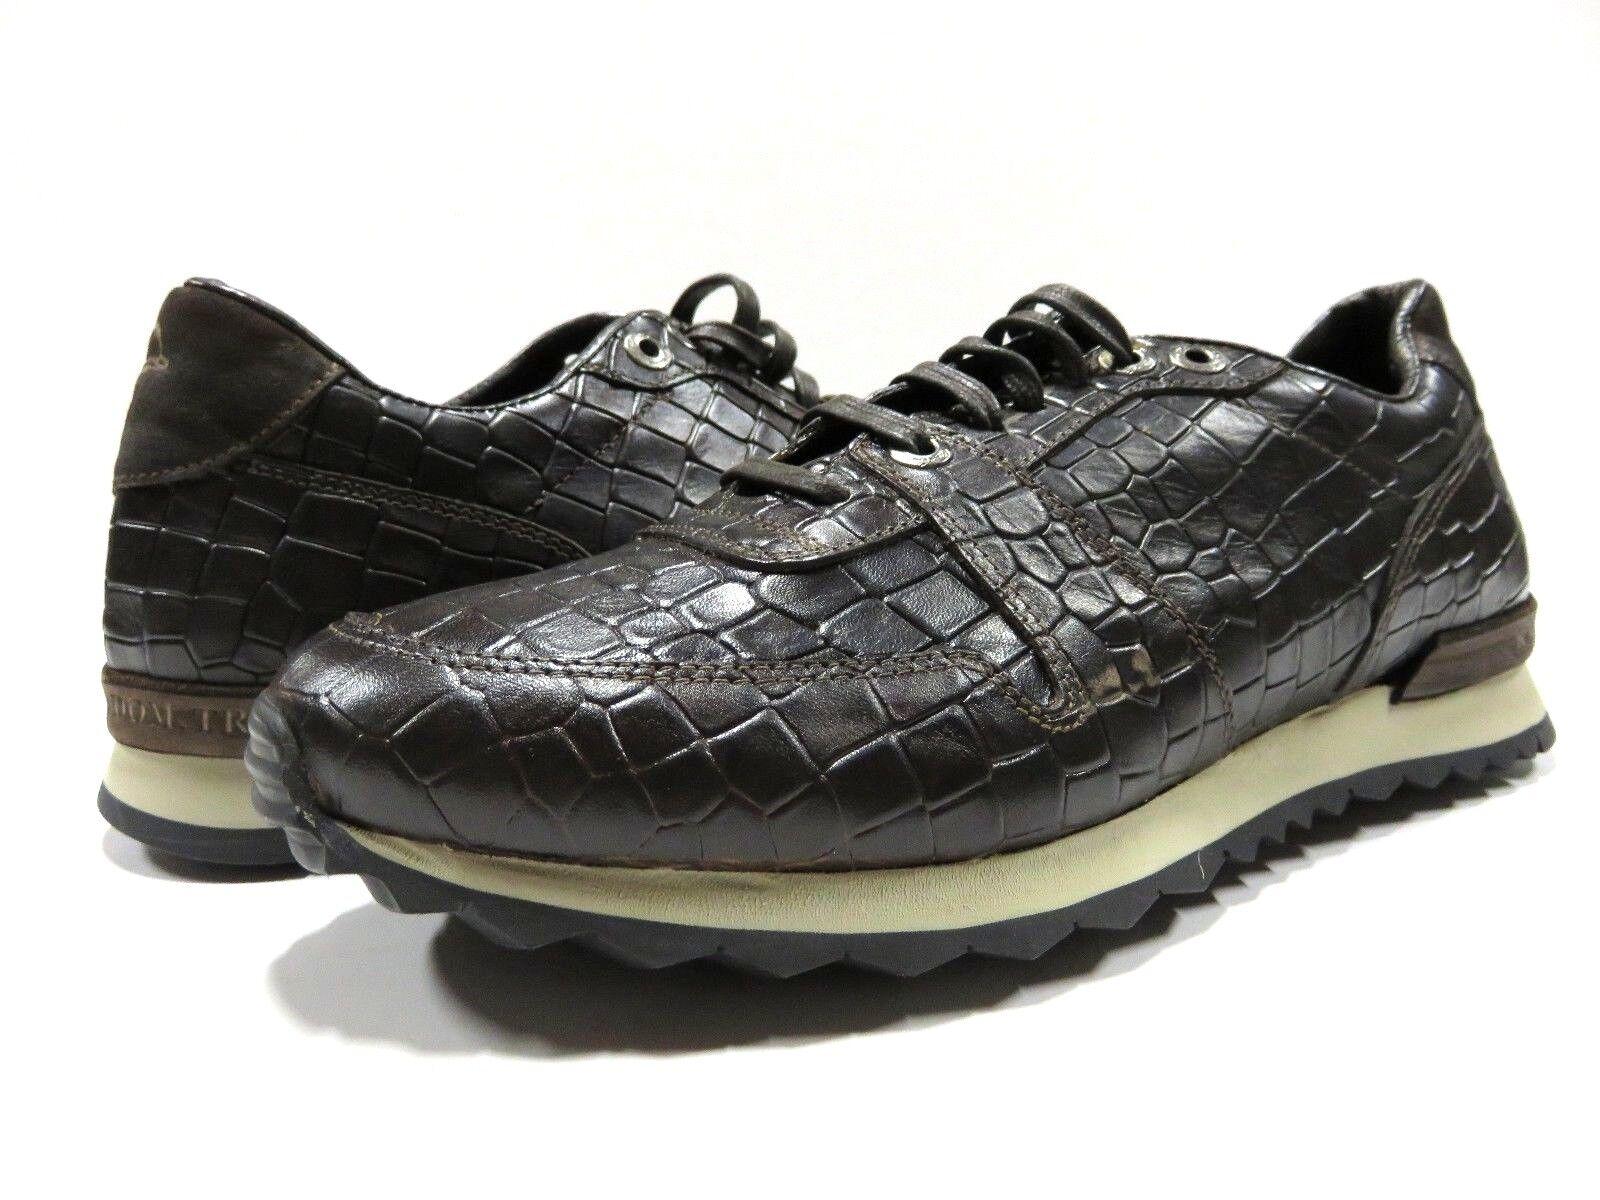 Robert Graham Knowledge Wisdom Truth Low Top Men's Casual shoes Men's Size 10